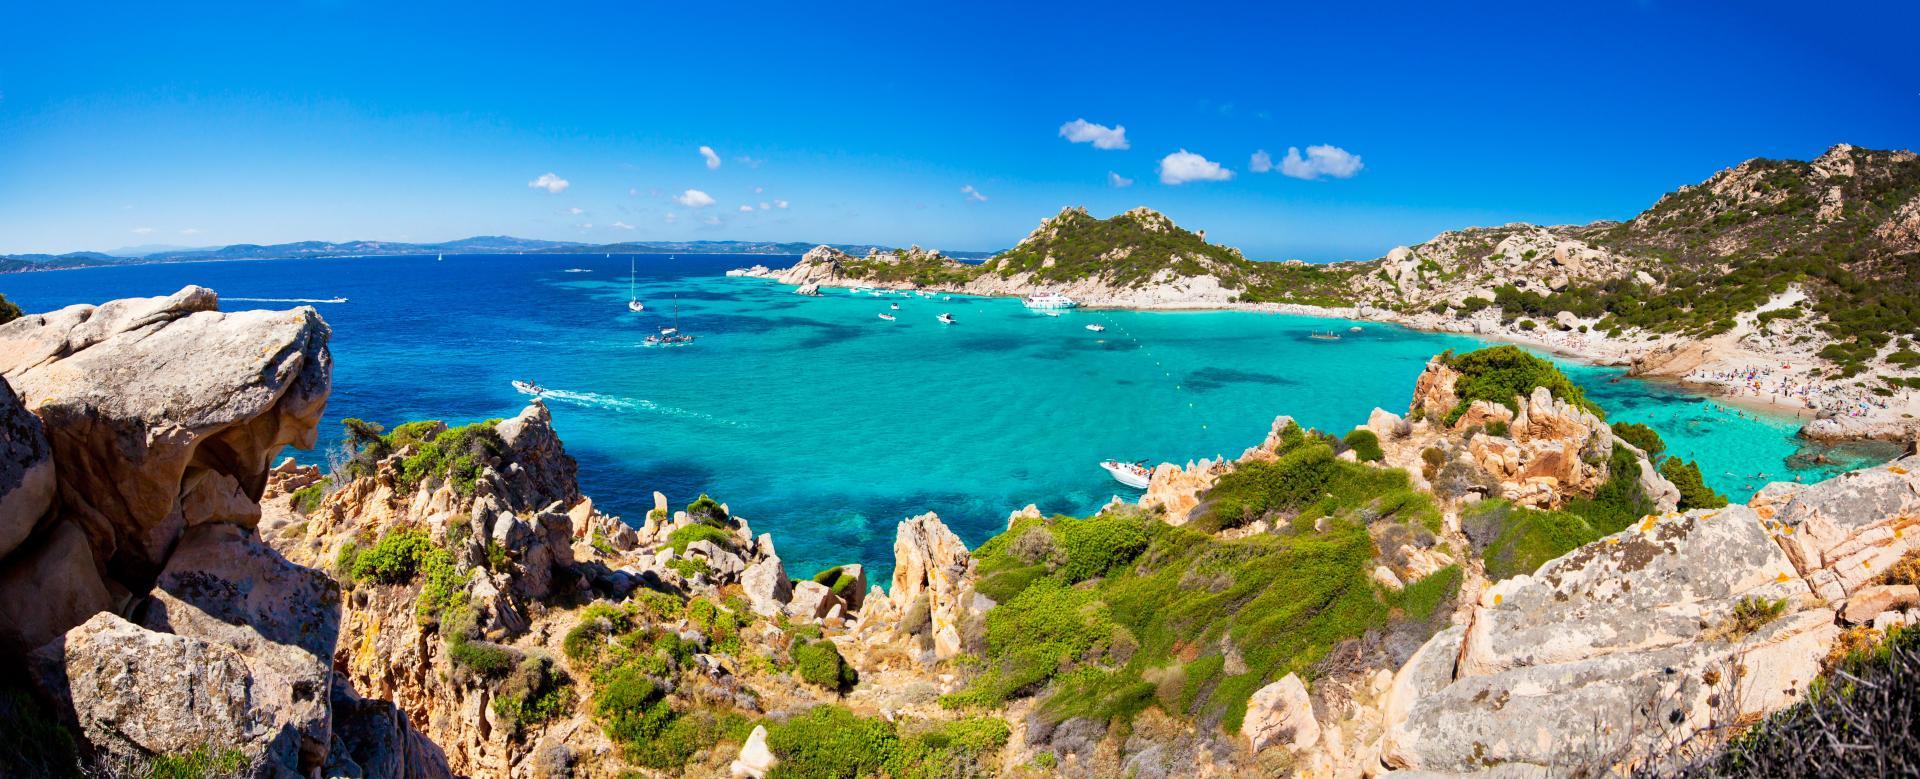 Voyage à pied : Sardaigne : selvaggio blu et supramonte